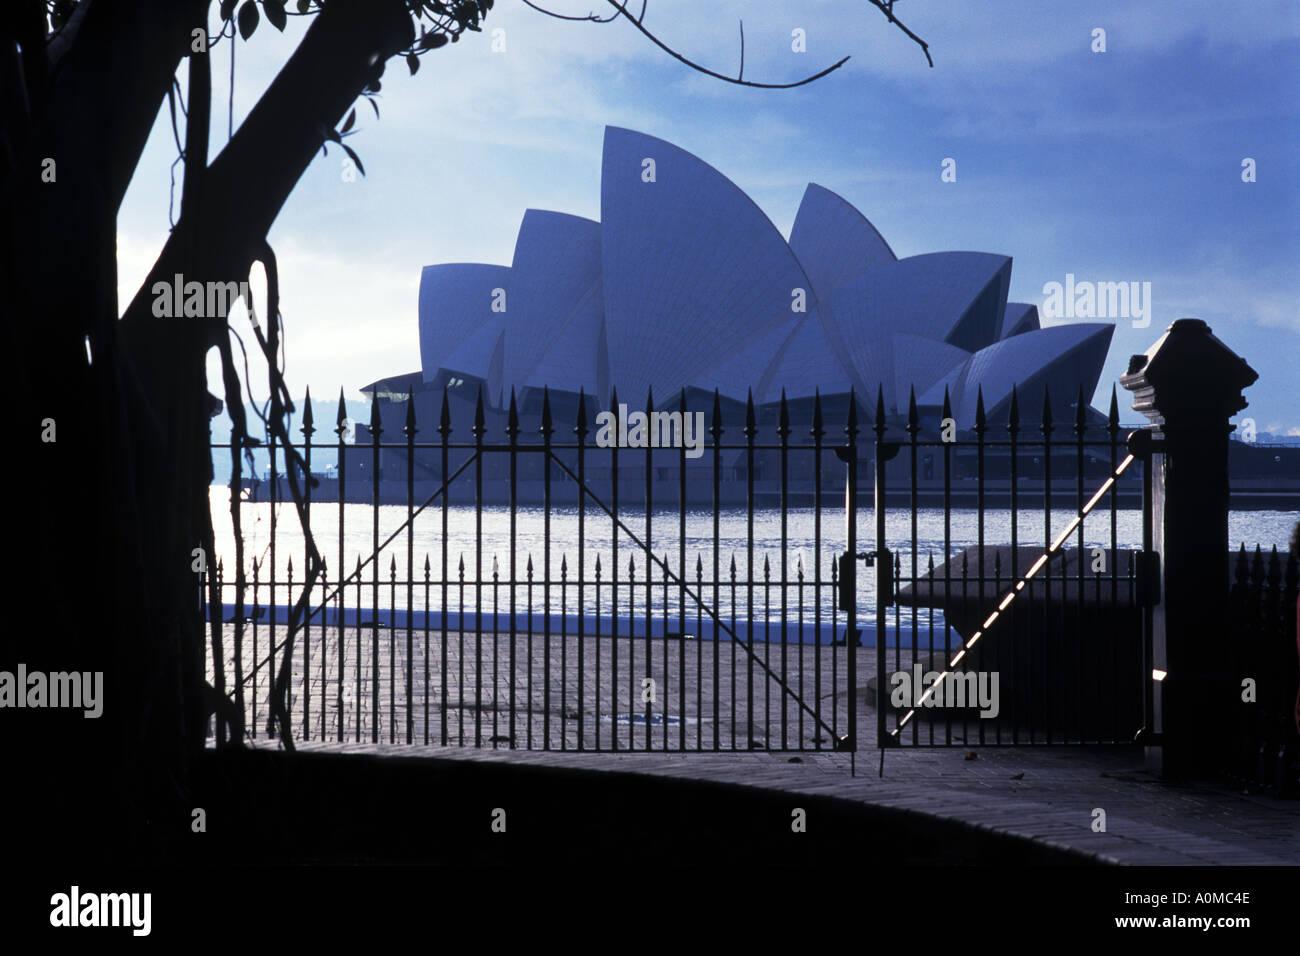 Famous Sydney Opera house on a grey day  - Stock Image